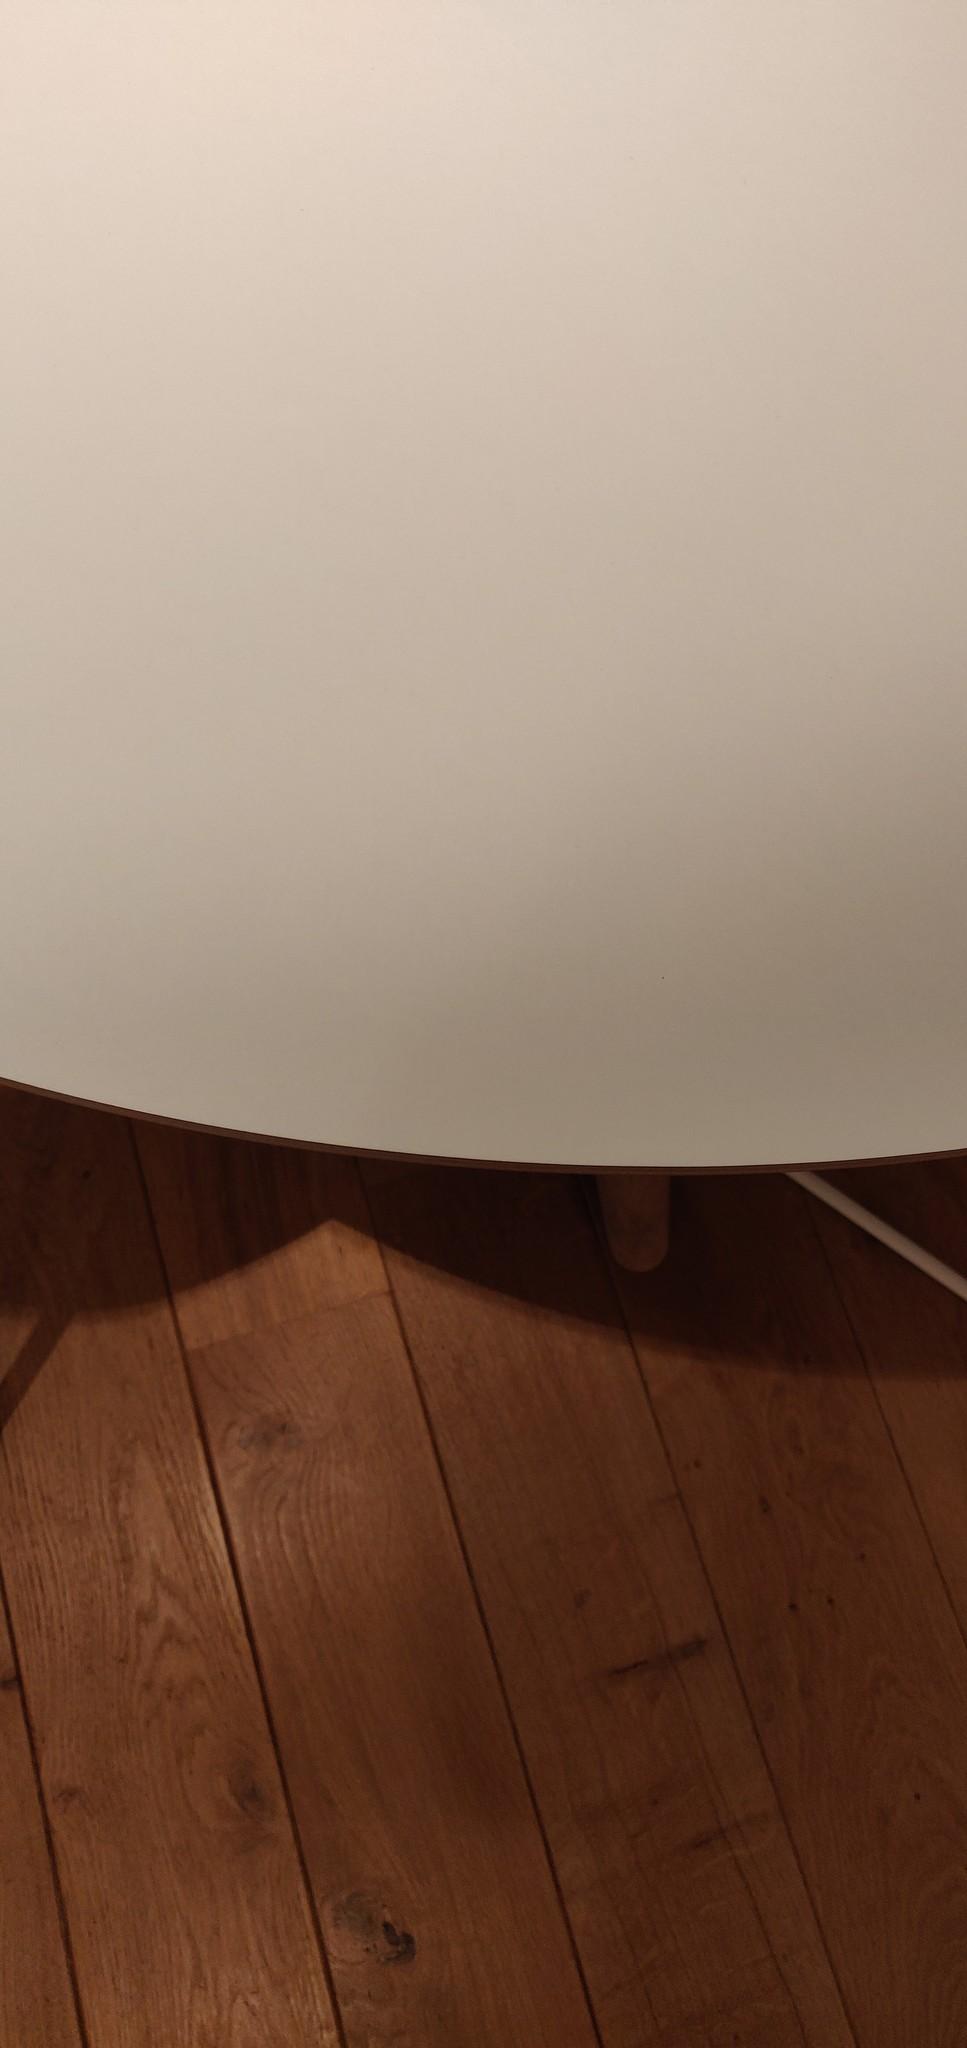 Toonzaalmodel CPH 20 - Matt lacquered solid oak White laminate dia120cm-2